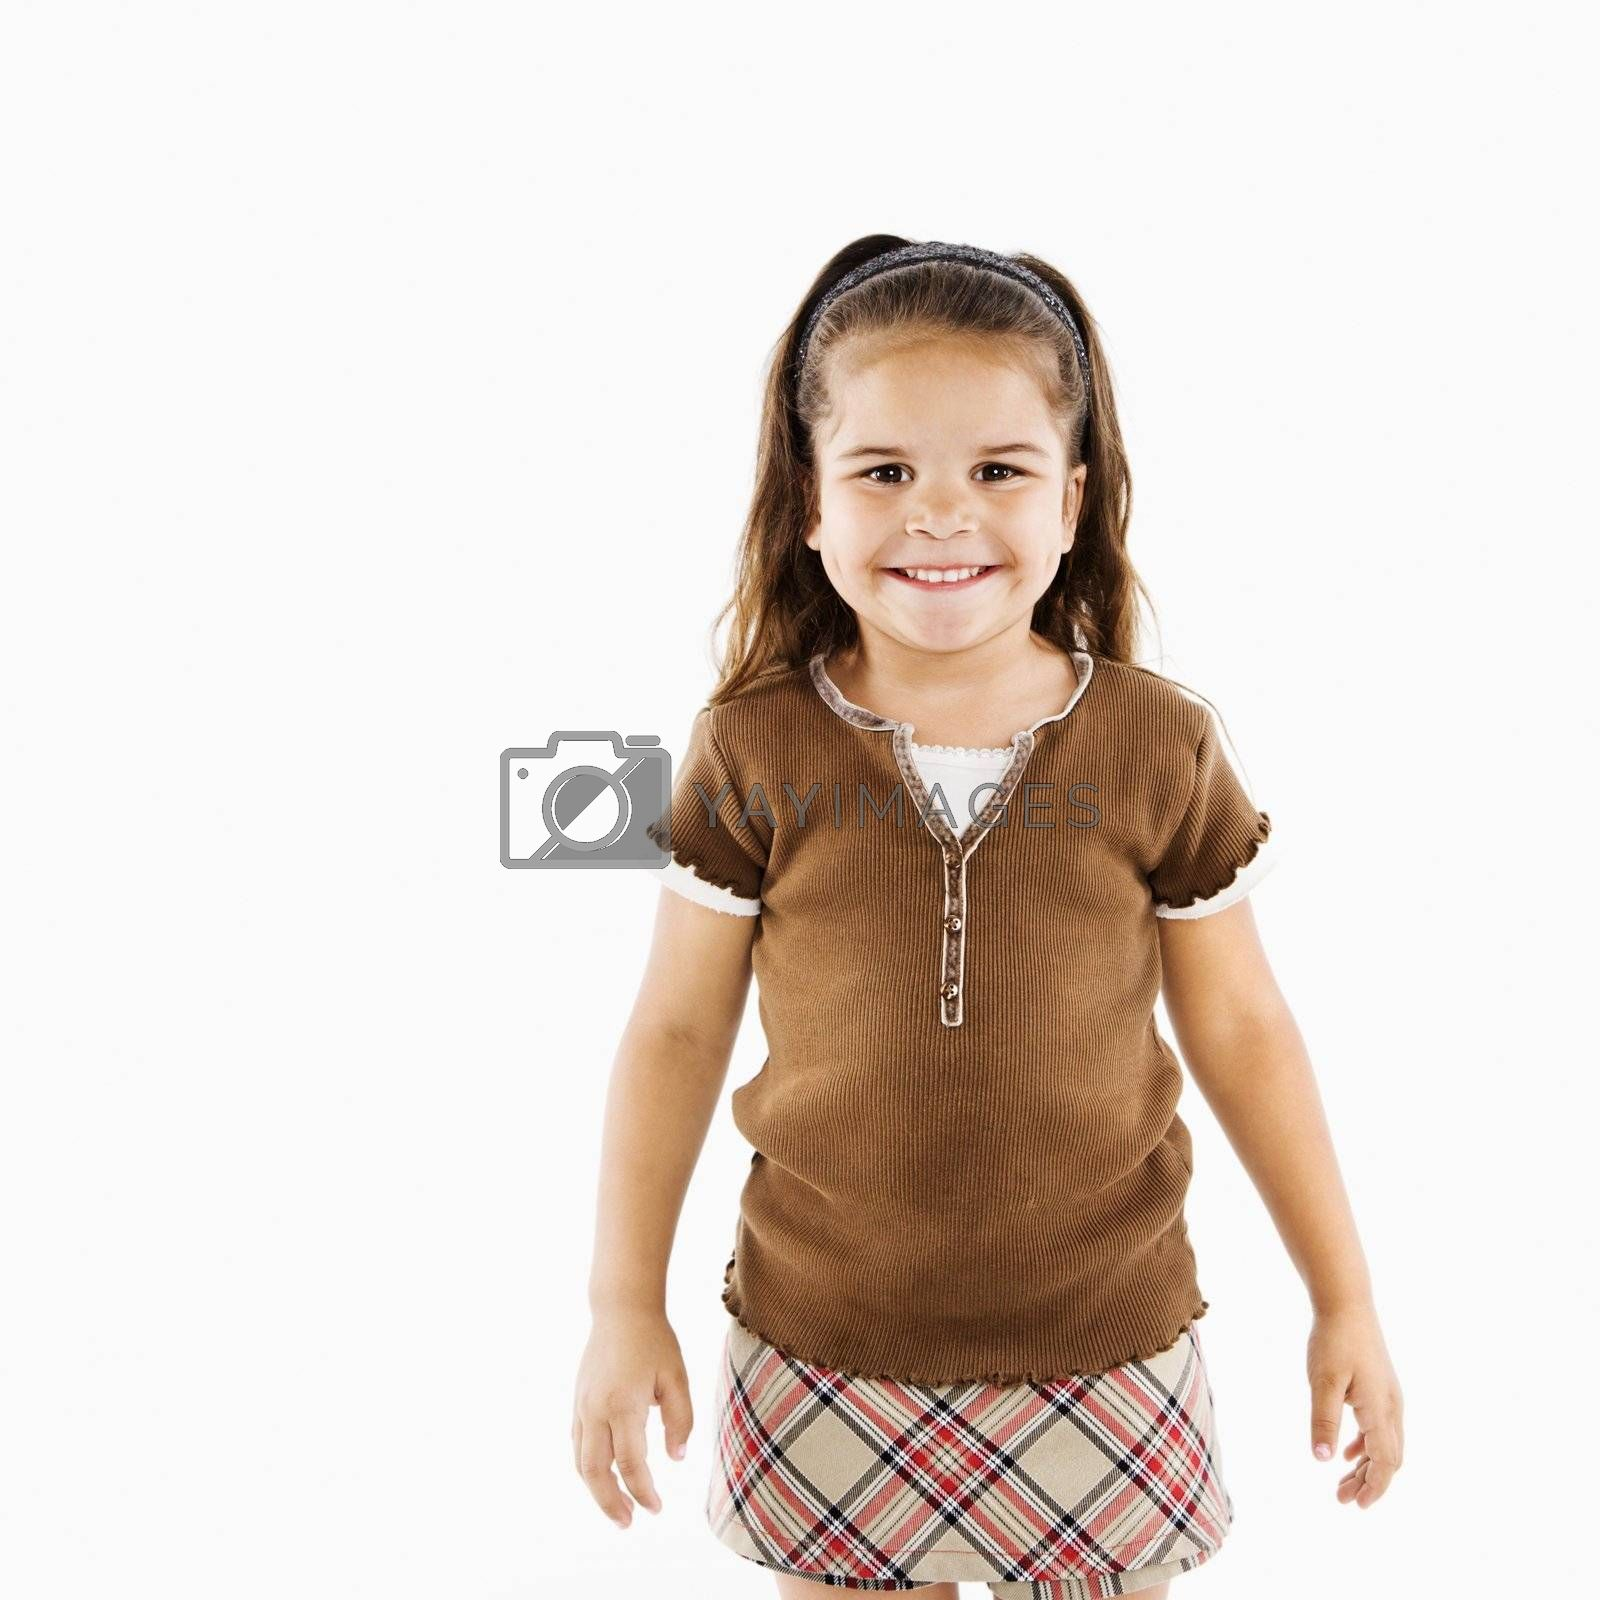 Adorable little hispanic girl standing smiling.